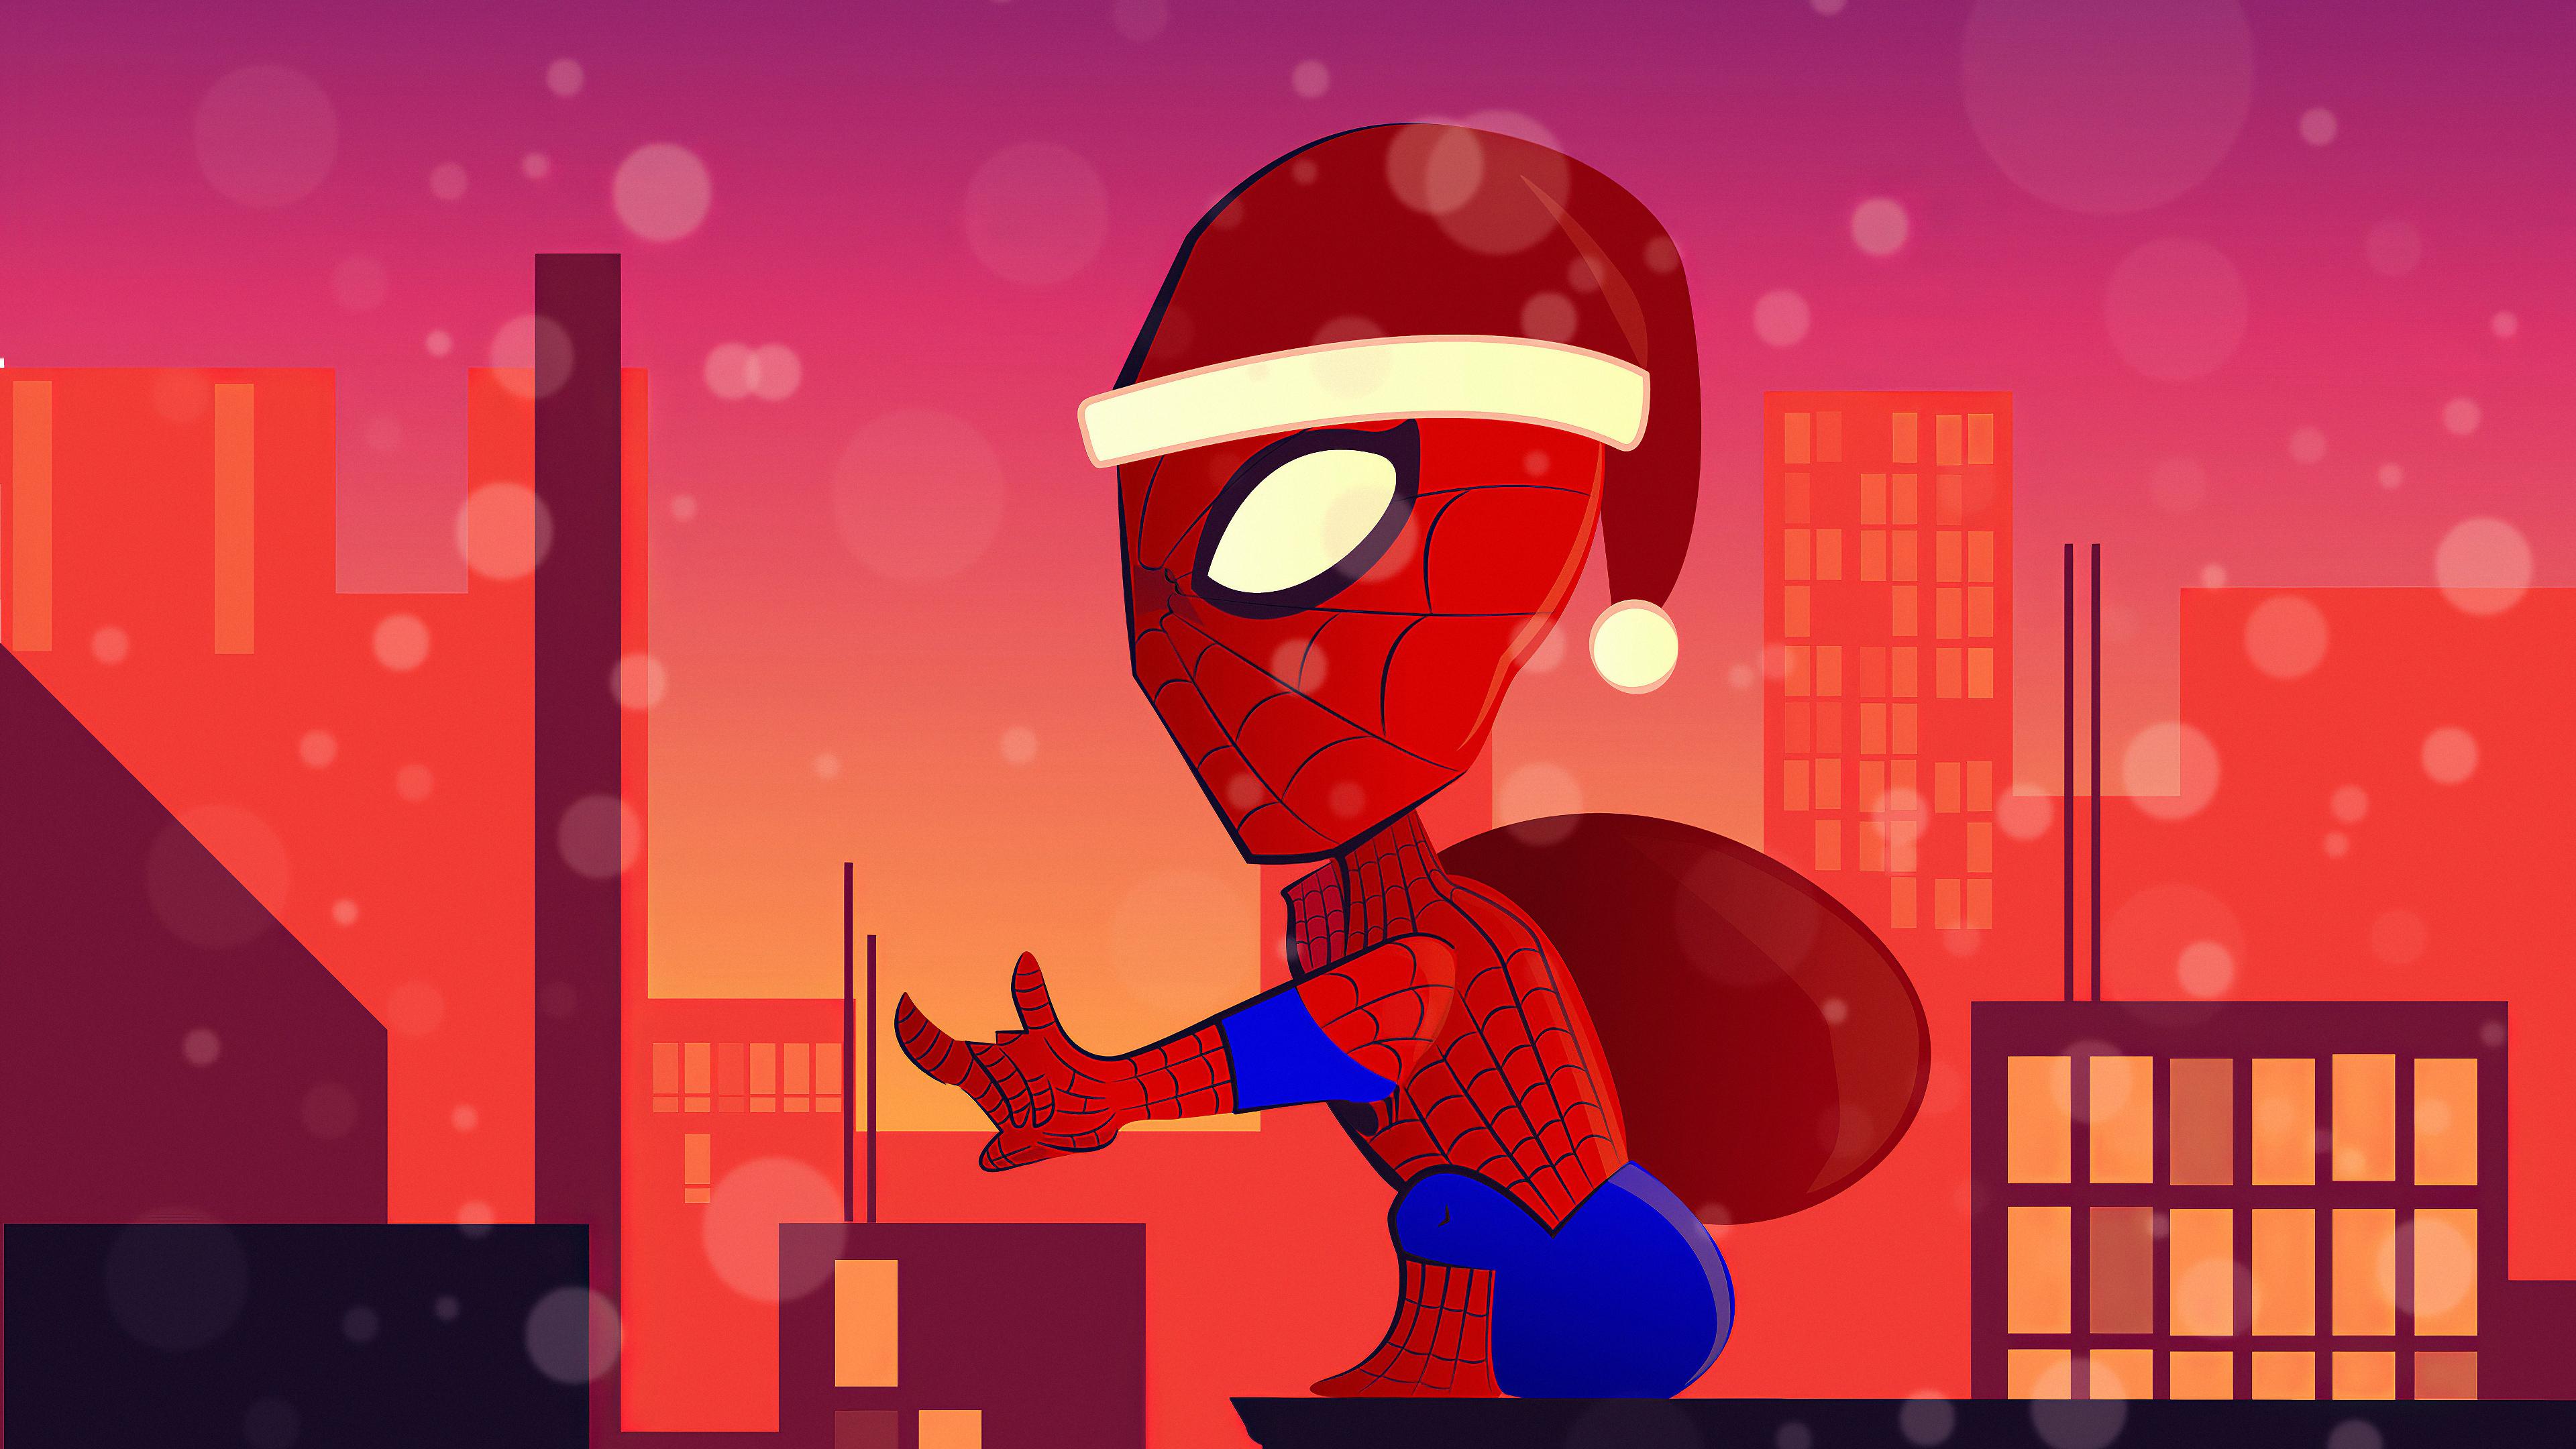 spiderman santa claus 1576088819 - Spiderman Santa Claus - Spiderman Santa hd 4k wallpaper